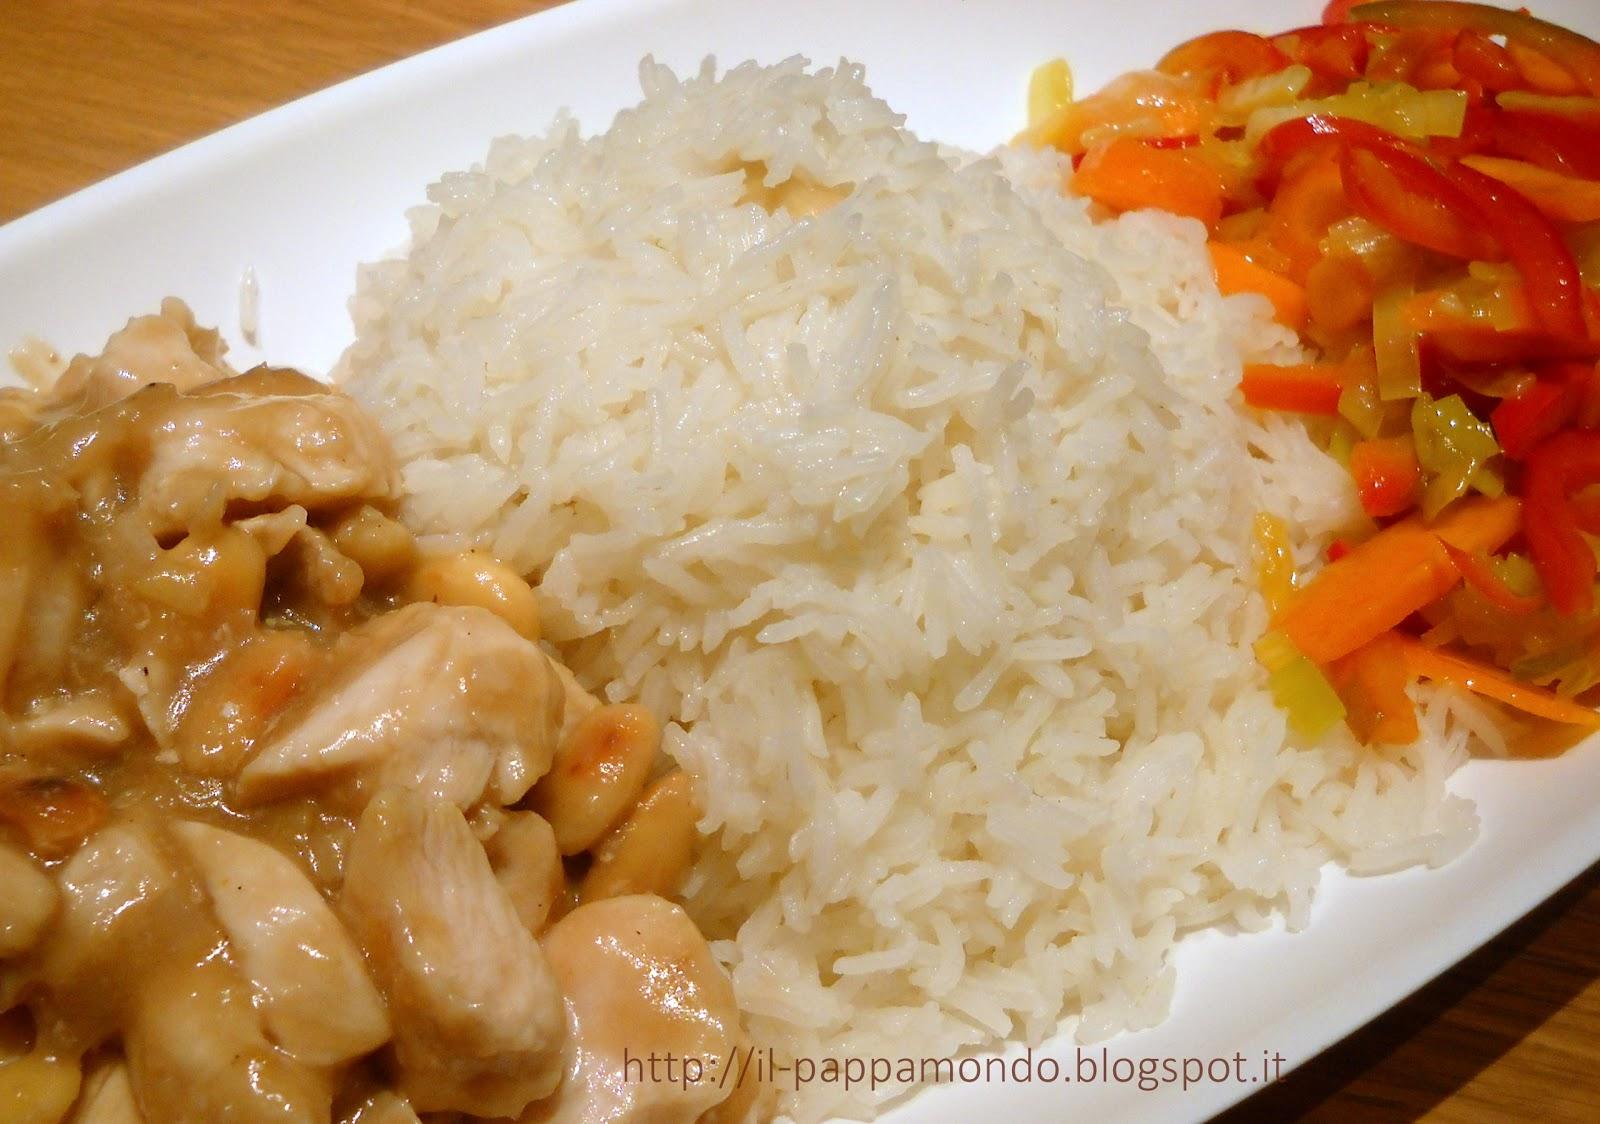 pollo alle mandorle con riso e verdure saltate